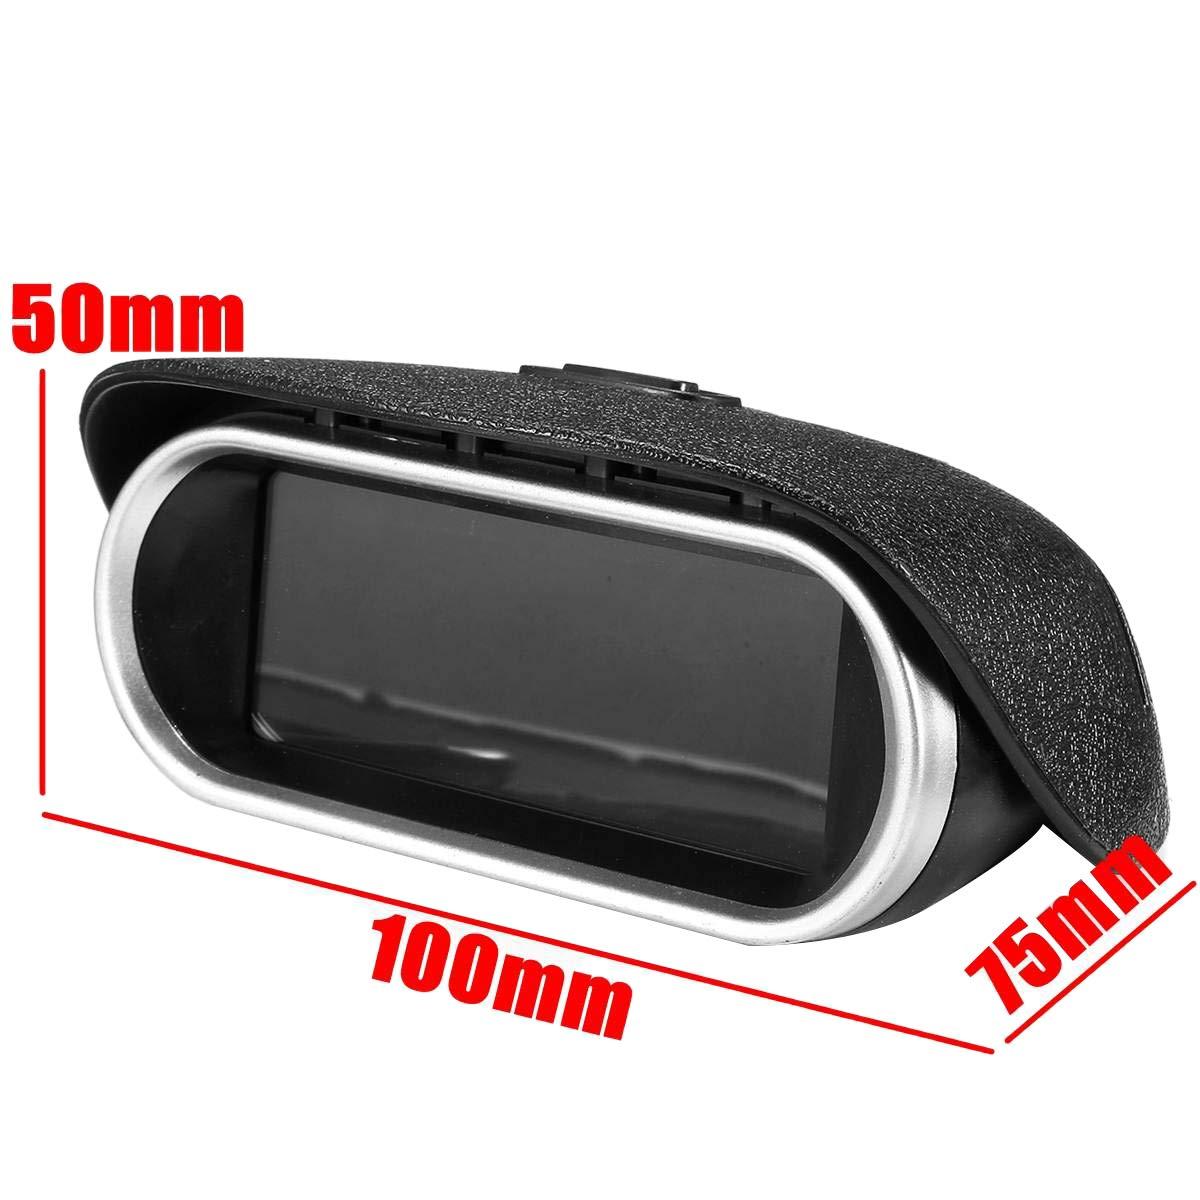 TOOGOO Auto Universal 50-9999 RPM Drehzahlmesser LCD Digital Anzeige Motor Drehzahlmesser Boot LKW LCD Bildschirm Drehzahlmesser